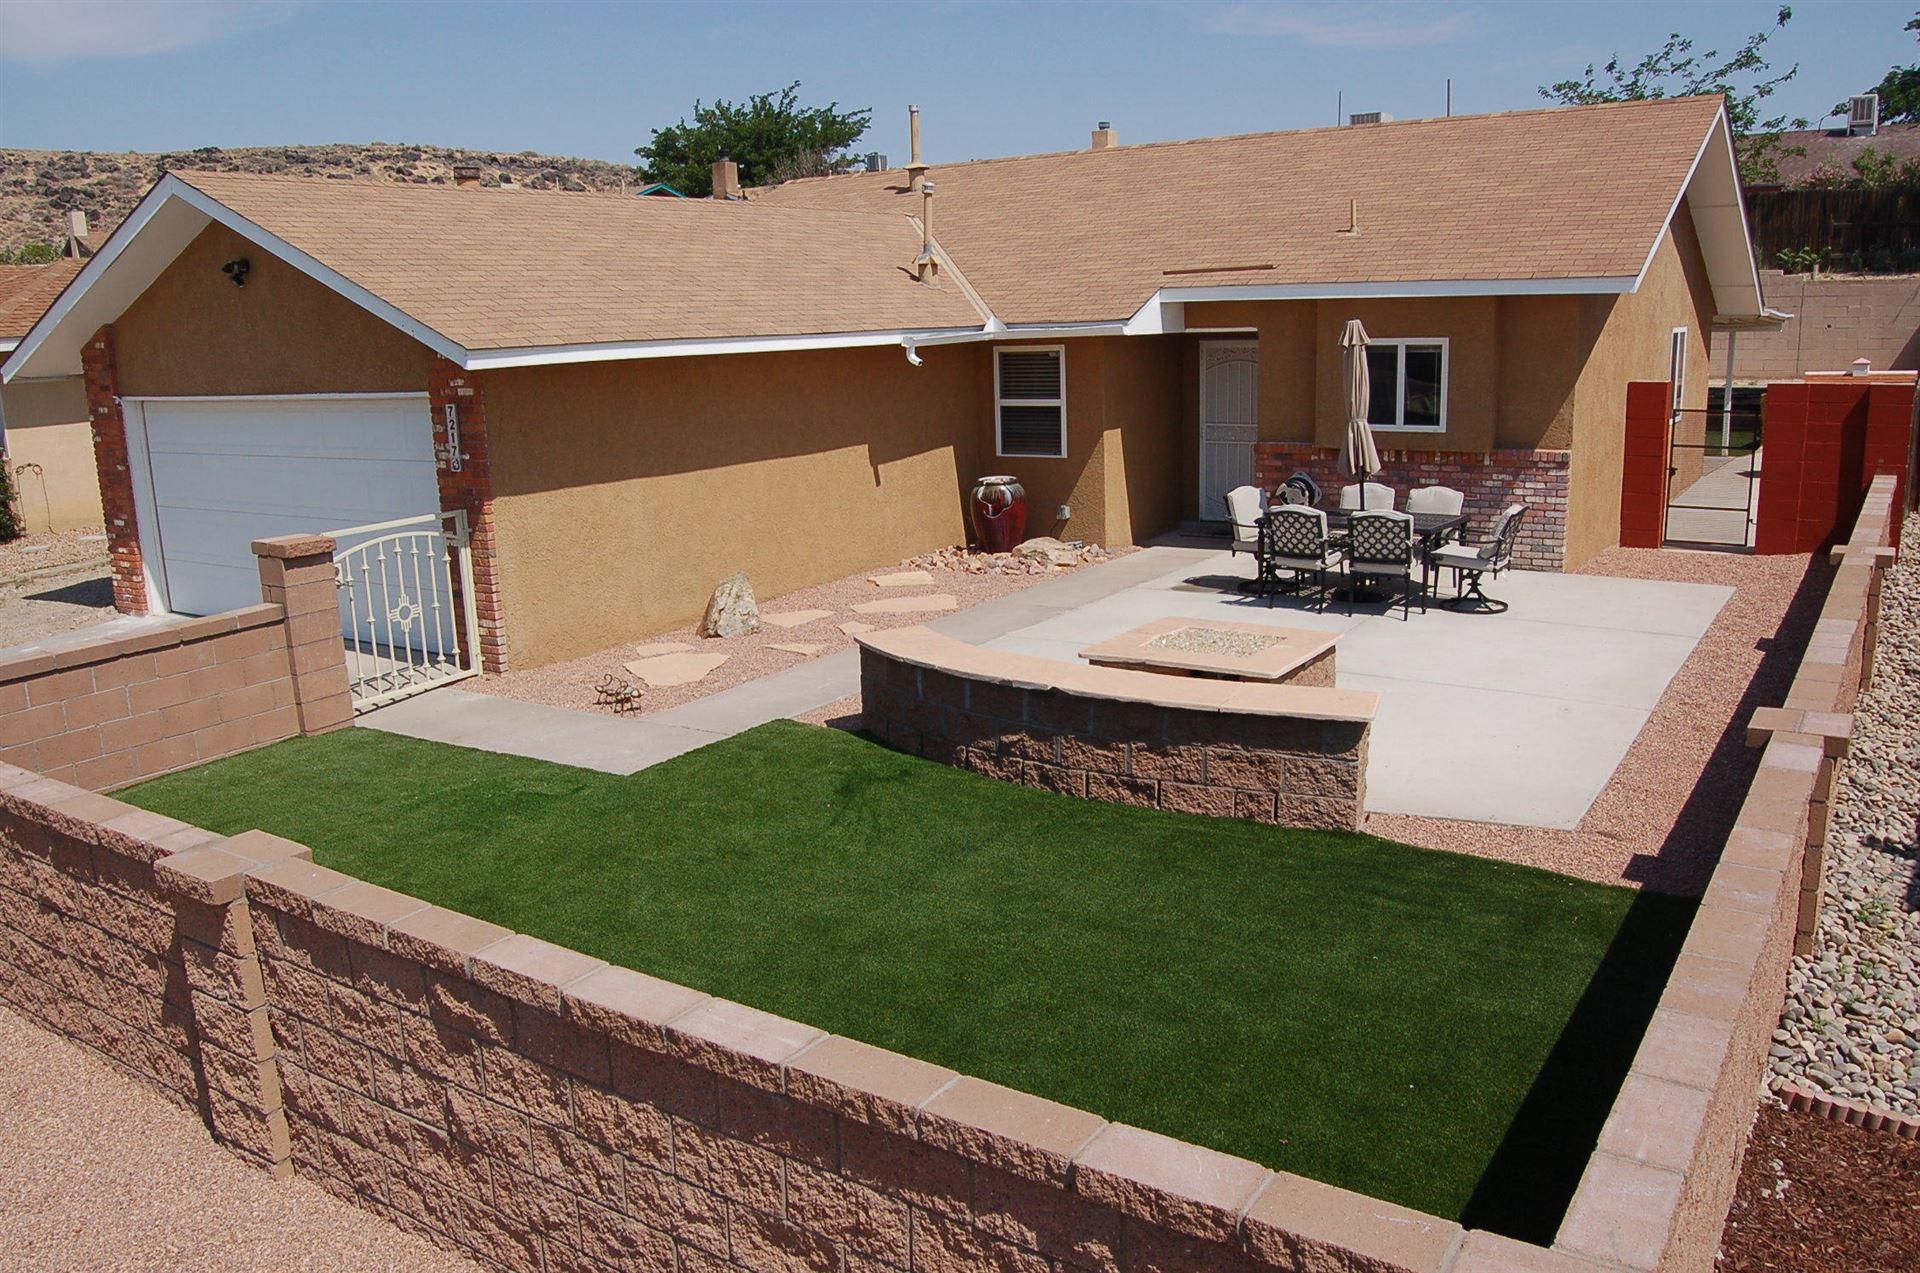 Photo of 7217 MINEHEAD Street NW, Albuquerque, NM 87120 (MLS # 994715)